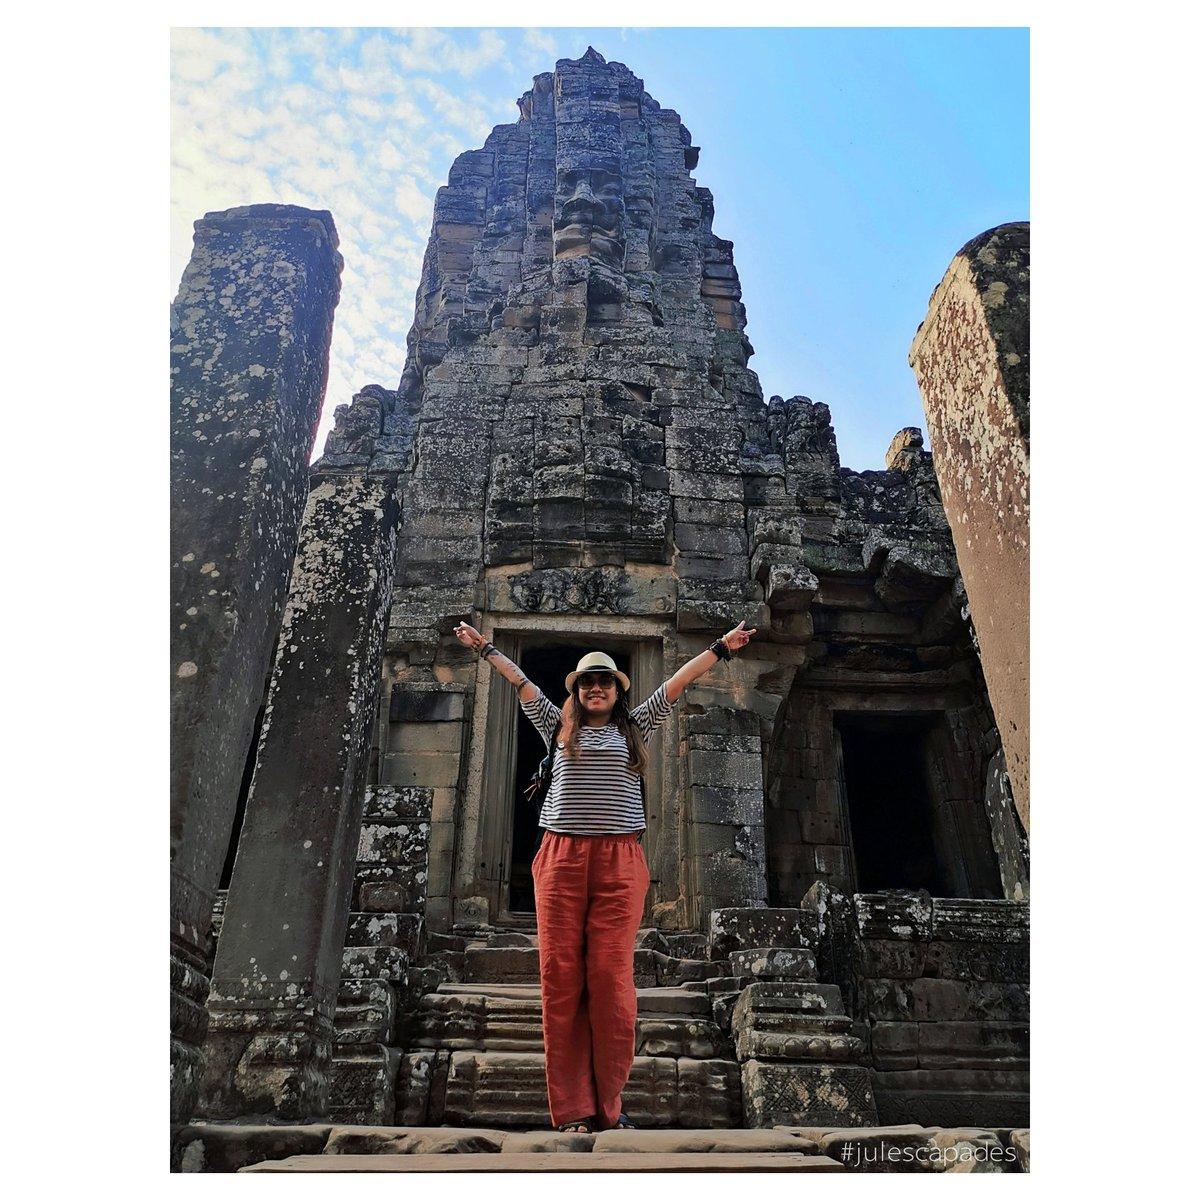 Say Veeeeeee 💜😁  #julescapades #wheninCambodia #teamcrediblestravels #jpyksTravels #templerun #lol #travelasia  #travelphotography #cambodia #ruins #traveldiaries #travelblog #travelblogger #travelvlog #architecture #asia #southeastasia #asian #throwback #flashbackfriday